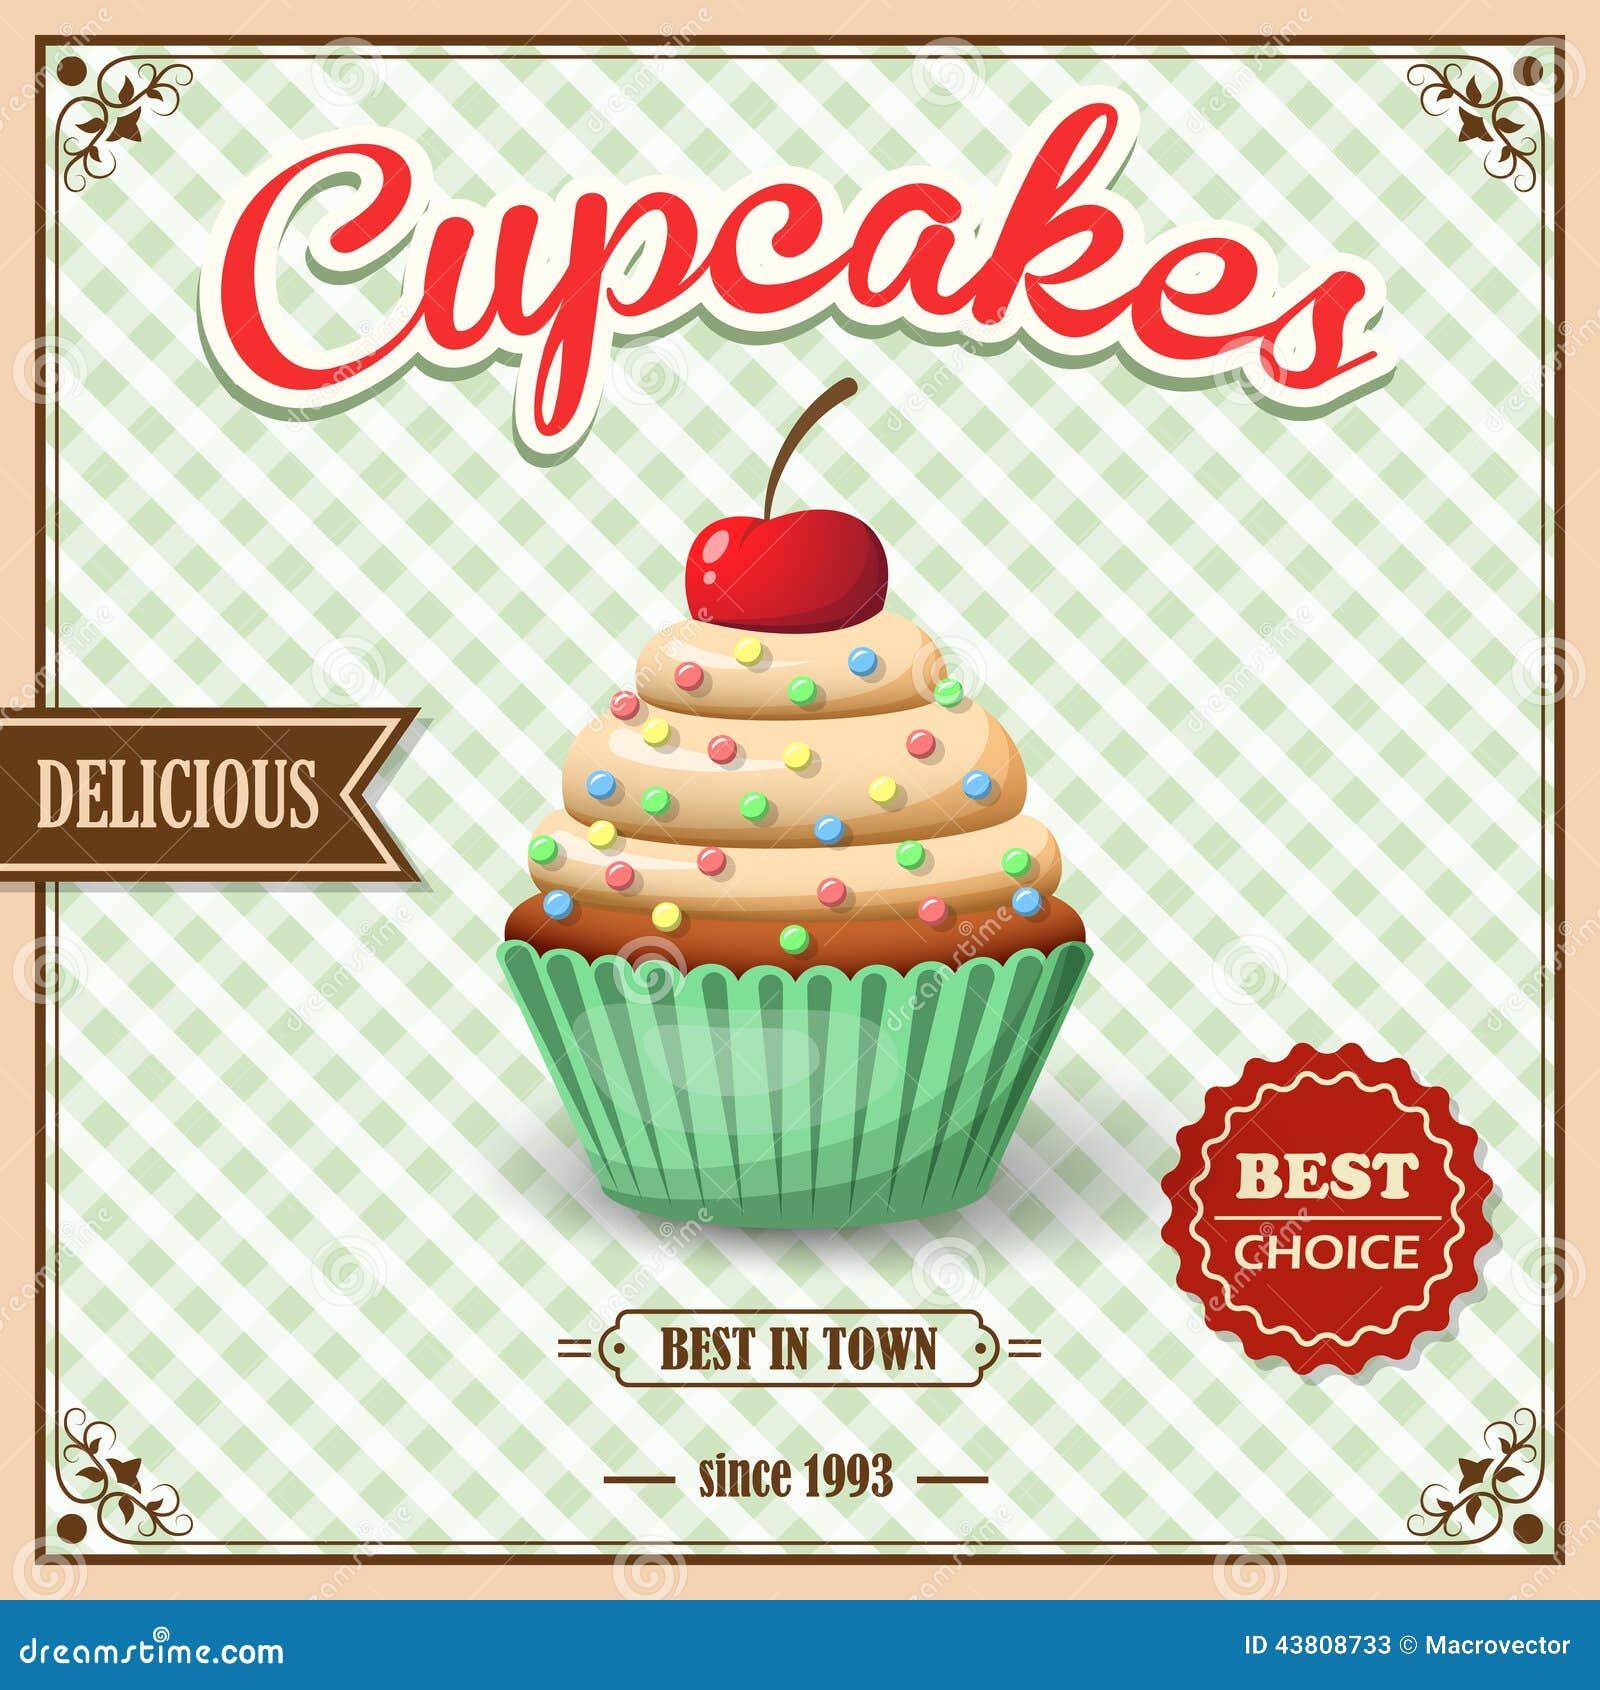 Cupcake Retro Poster Stock Vector - Image: 41817165